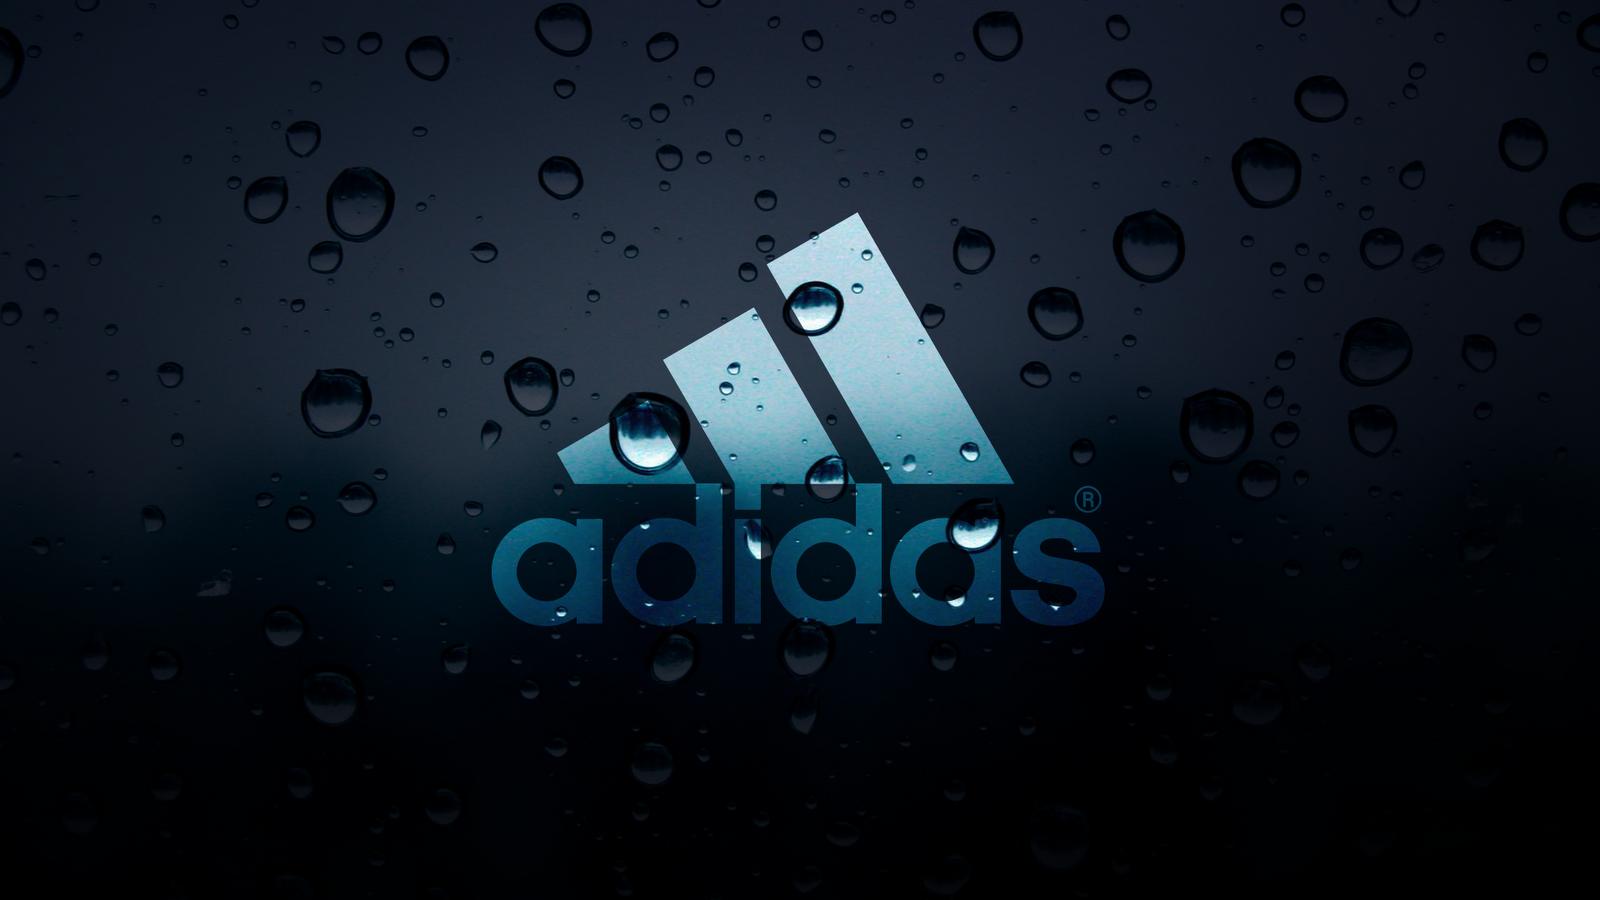 Adidas Water Drops Wallpaper 1600x900